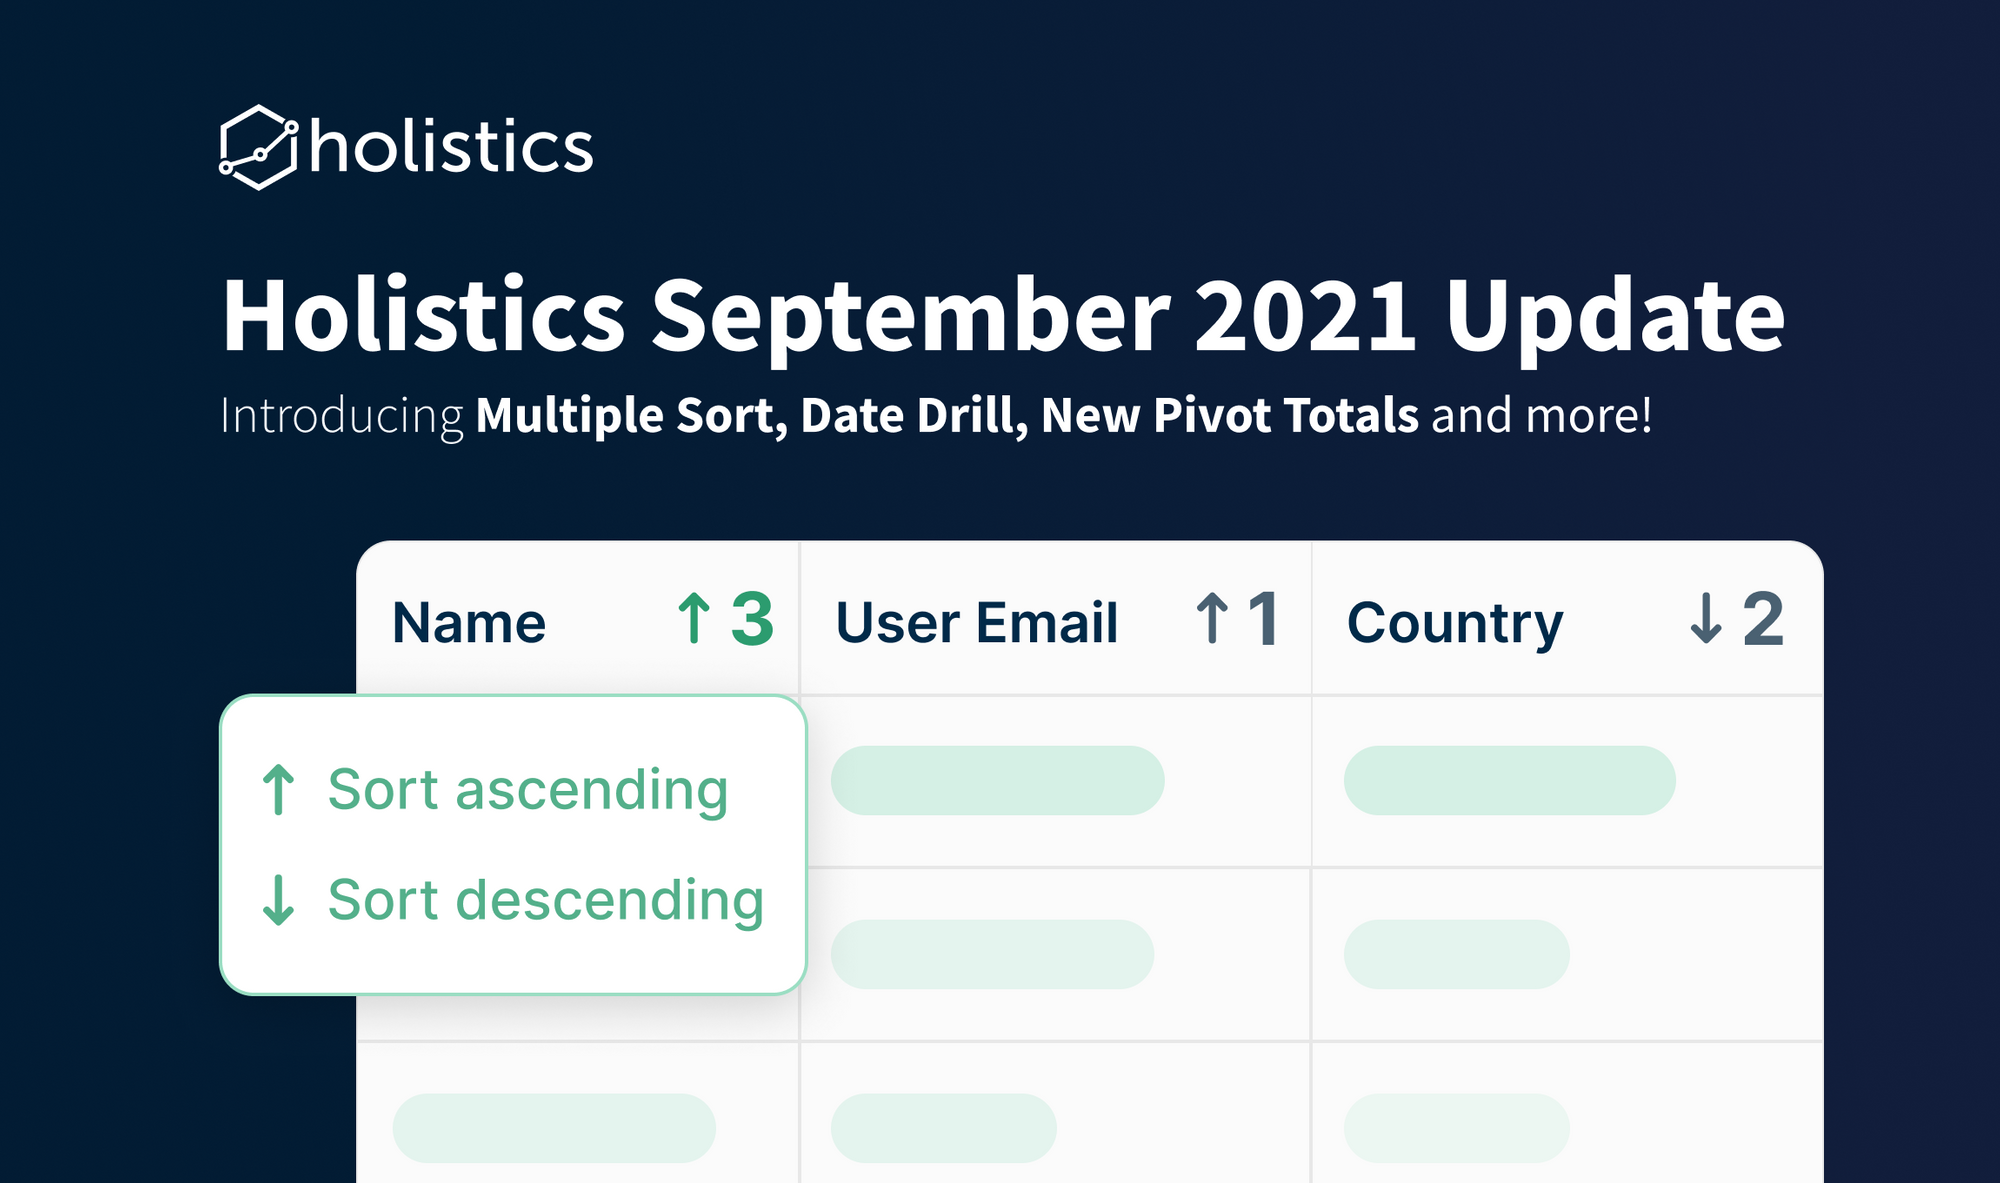 Holistics September 2021 Product Updates